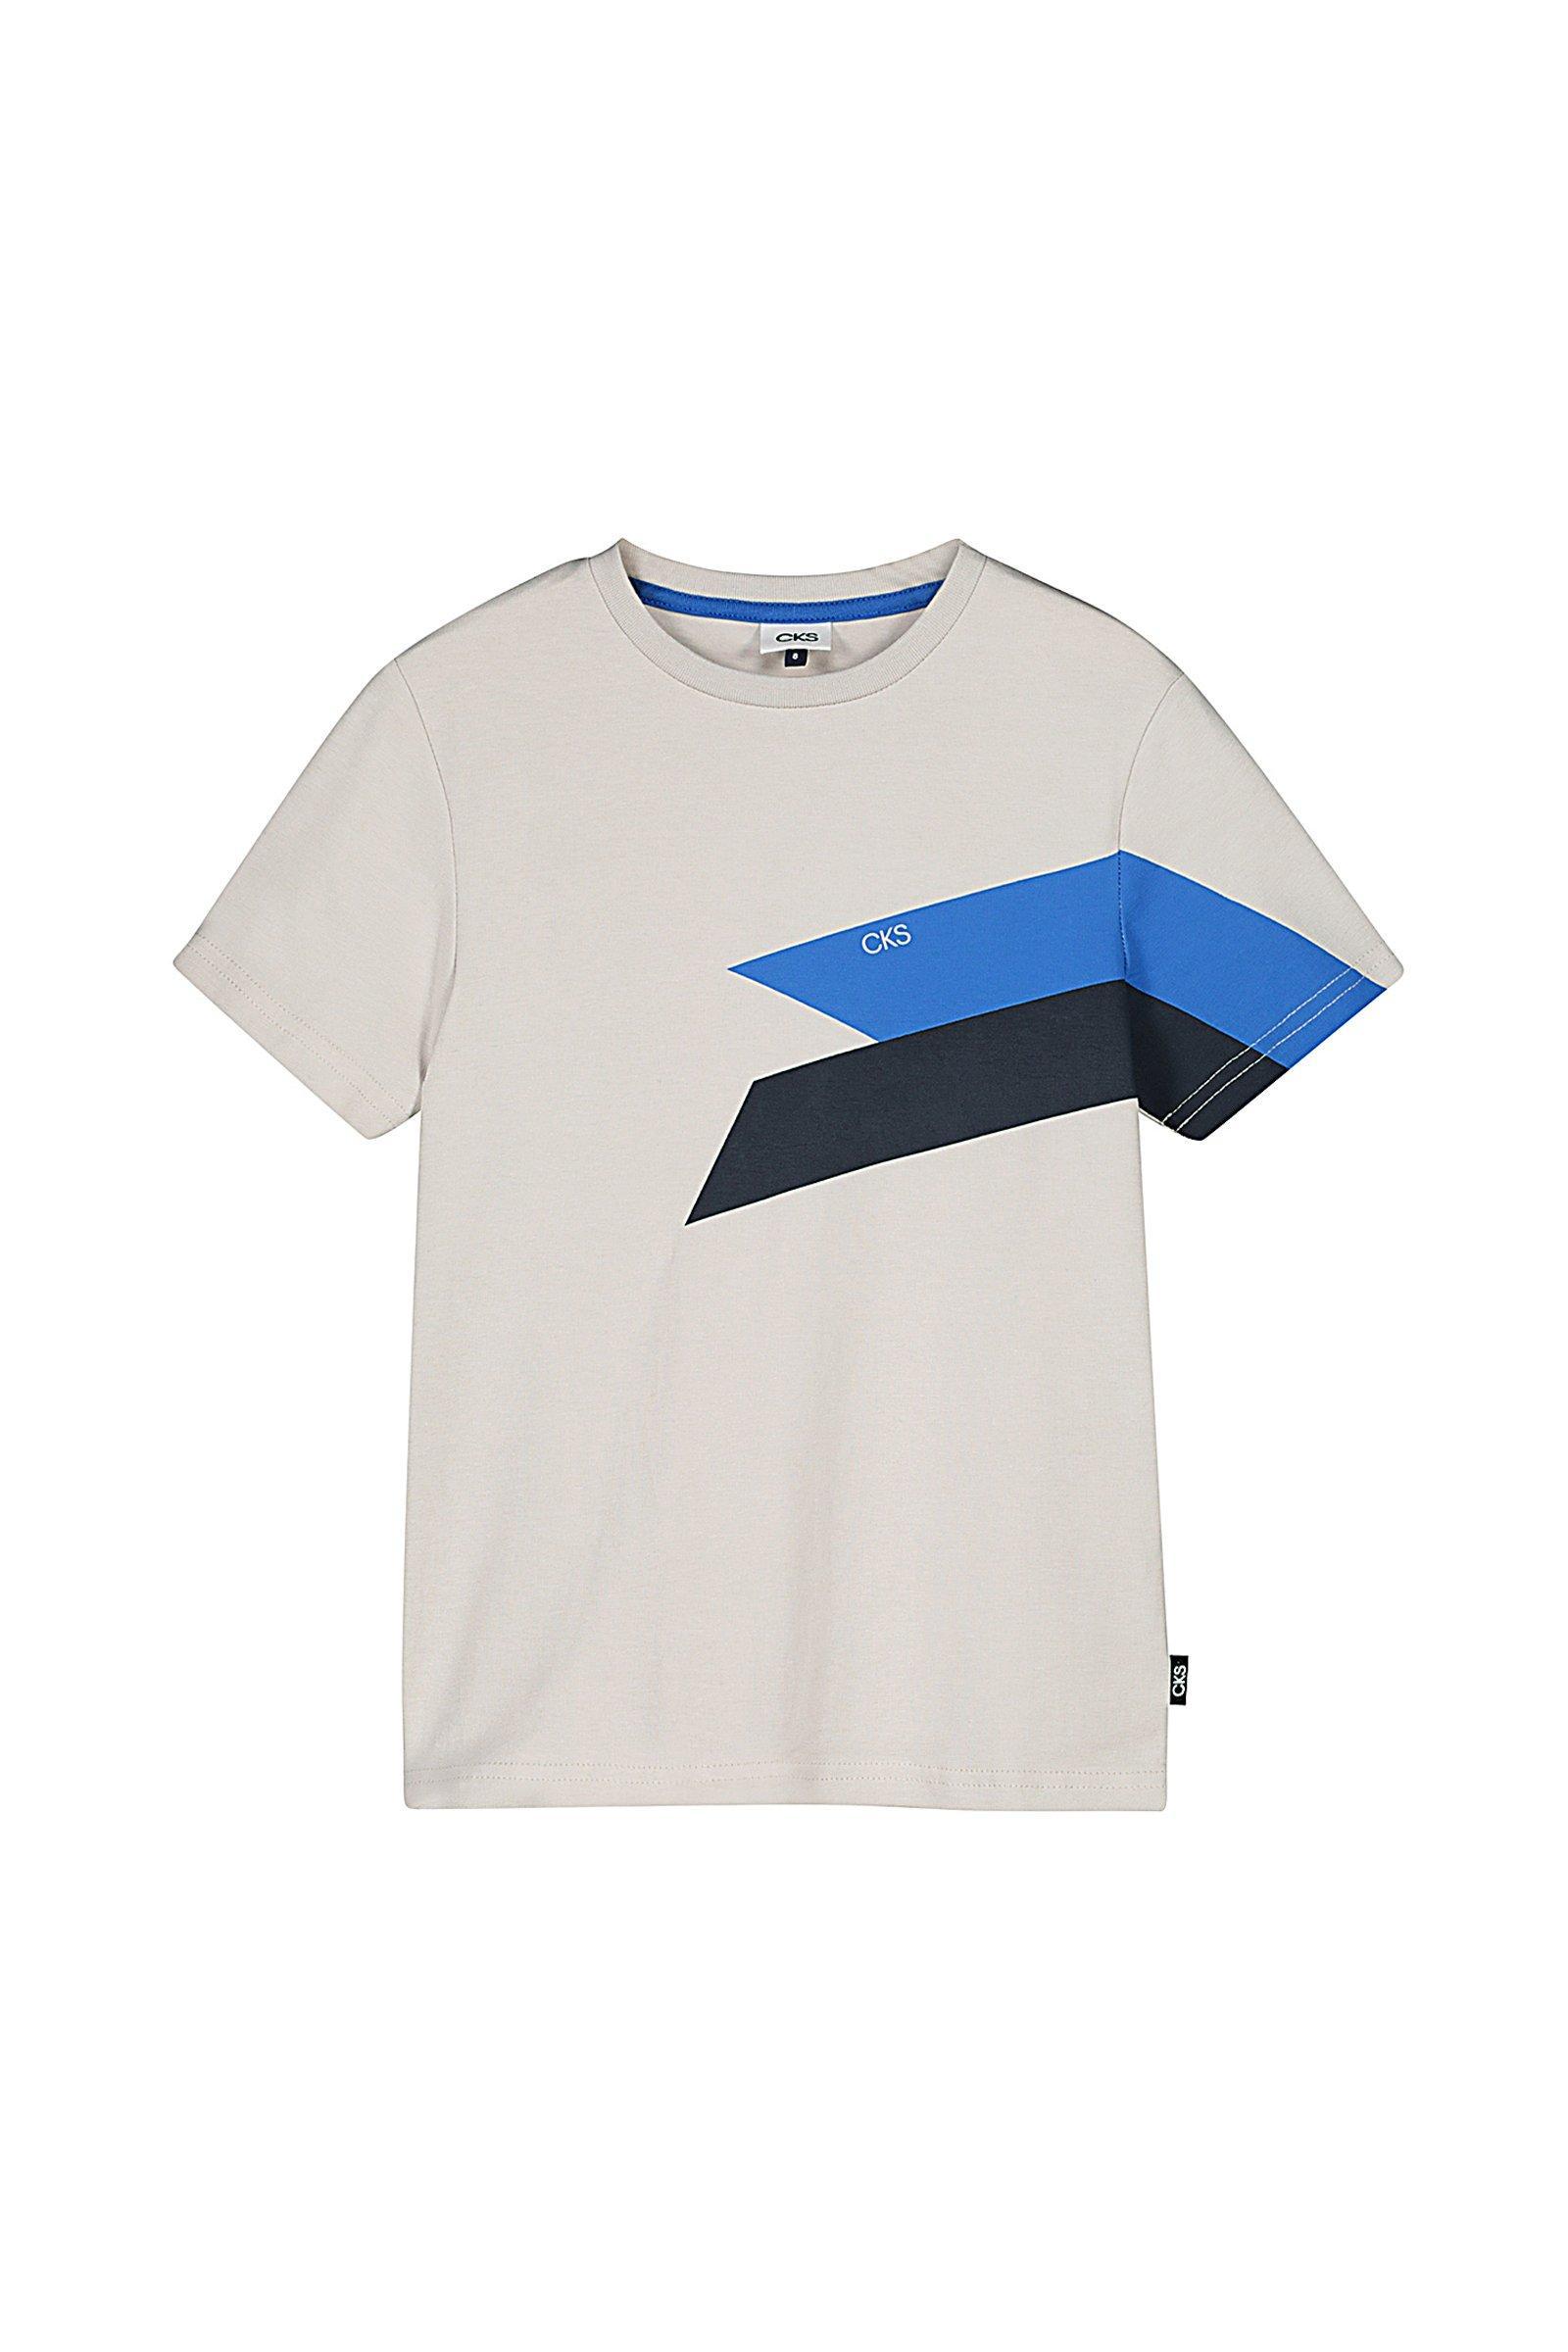 CKS Kids - YANICK - t-shirt korte mouwen - lichtbruin